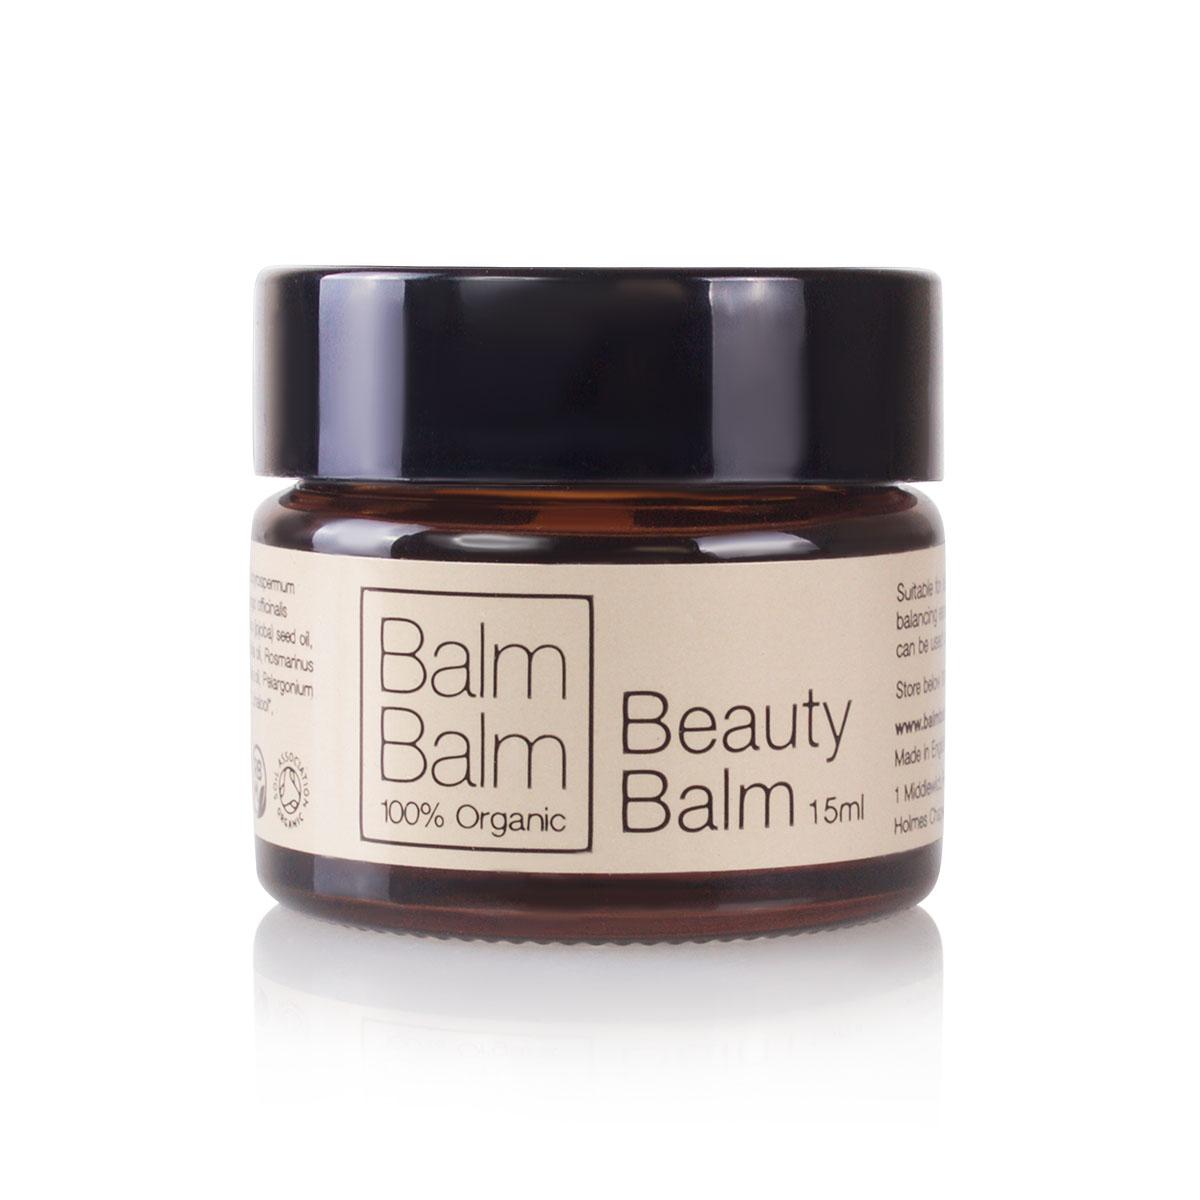 Balmbalm-beauty-balm-baume-beauté-bio